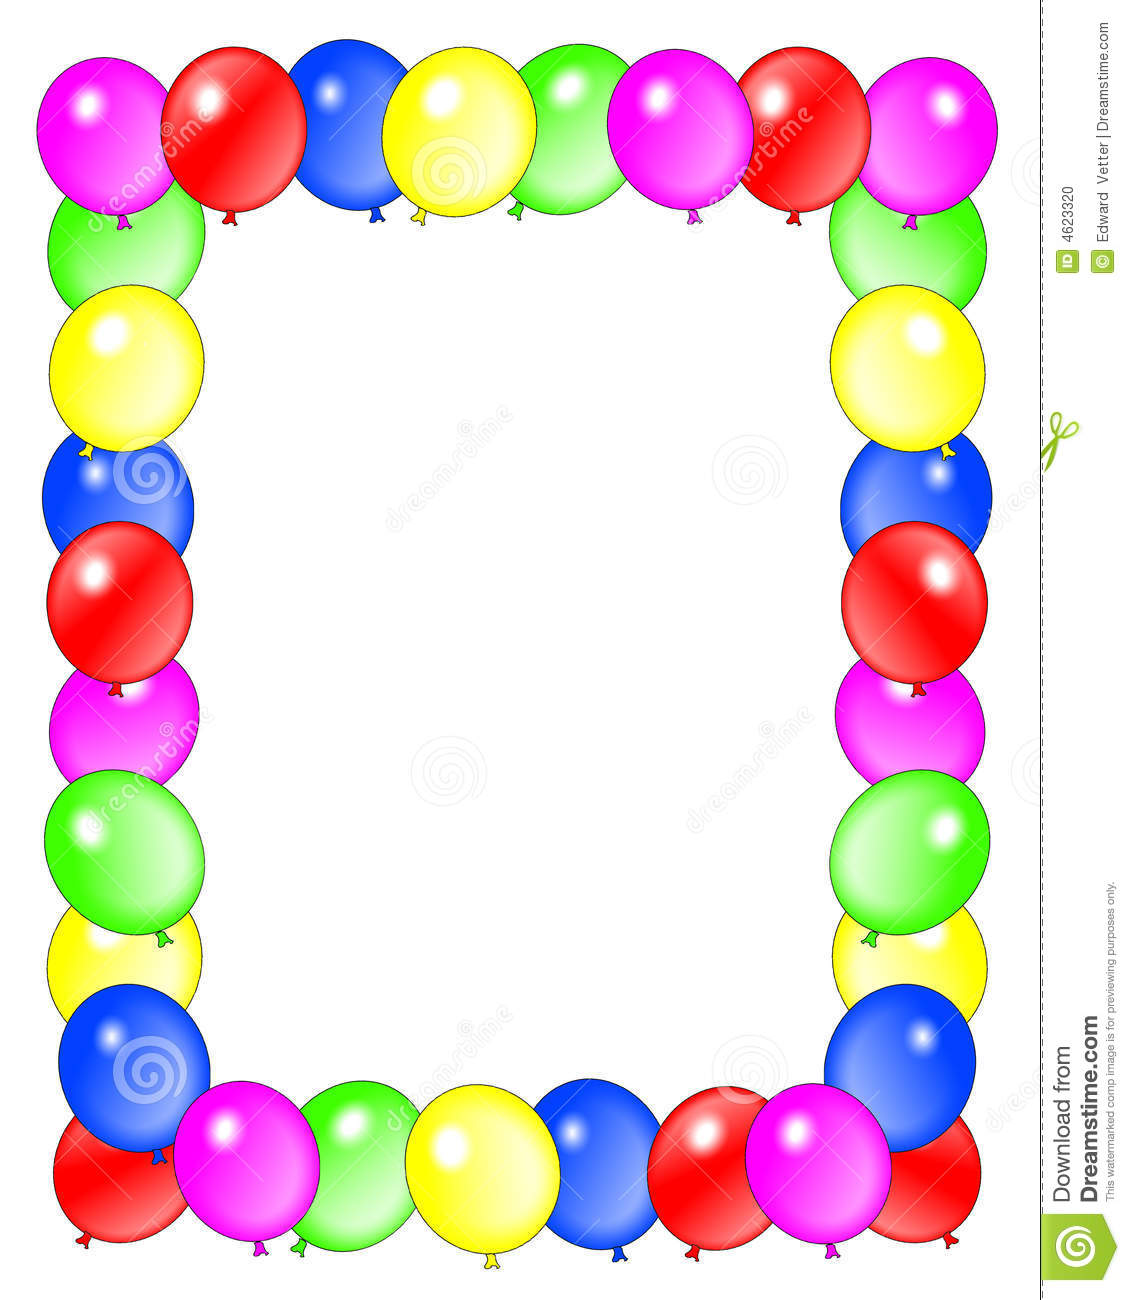 birthday-clip-art-borders-birthday-balloons-border-frame-4623320.jpg 1130 x 1300. Download. Birthday Clip Art Borders ...